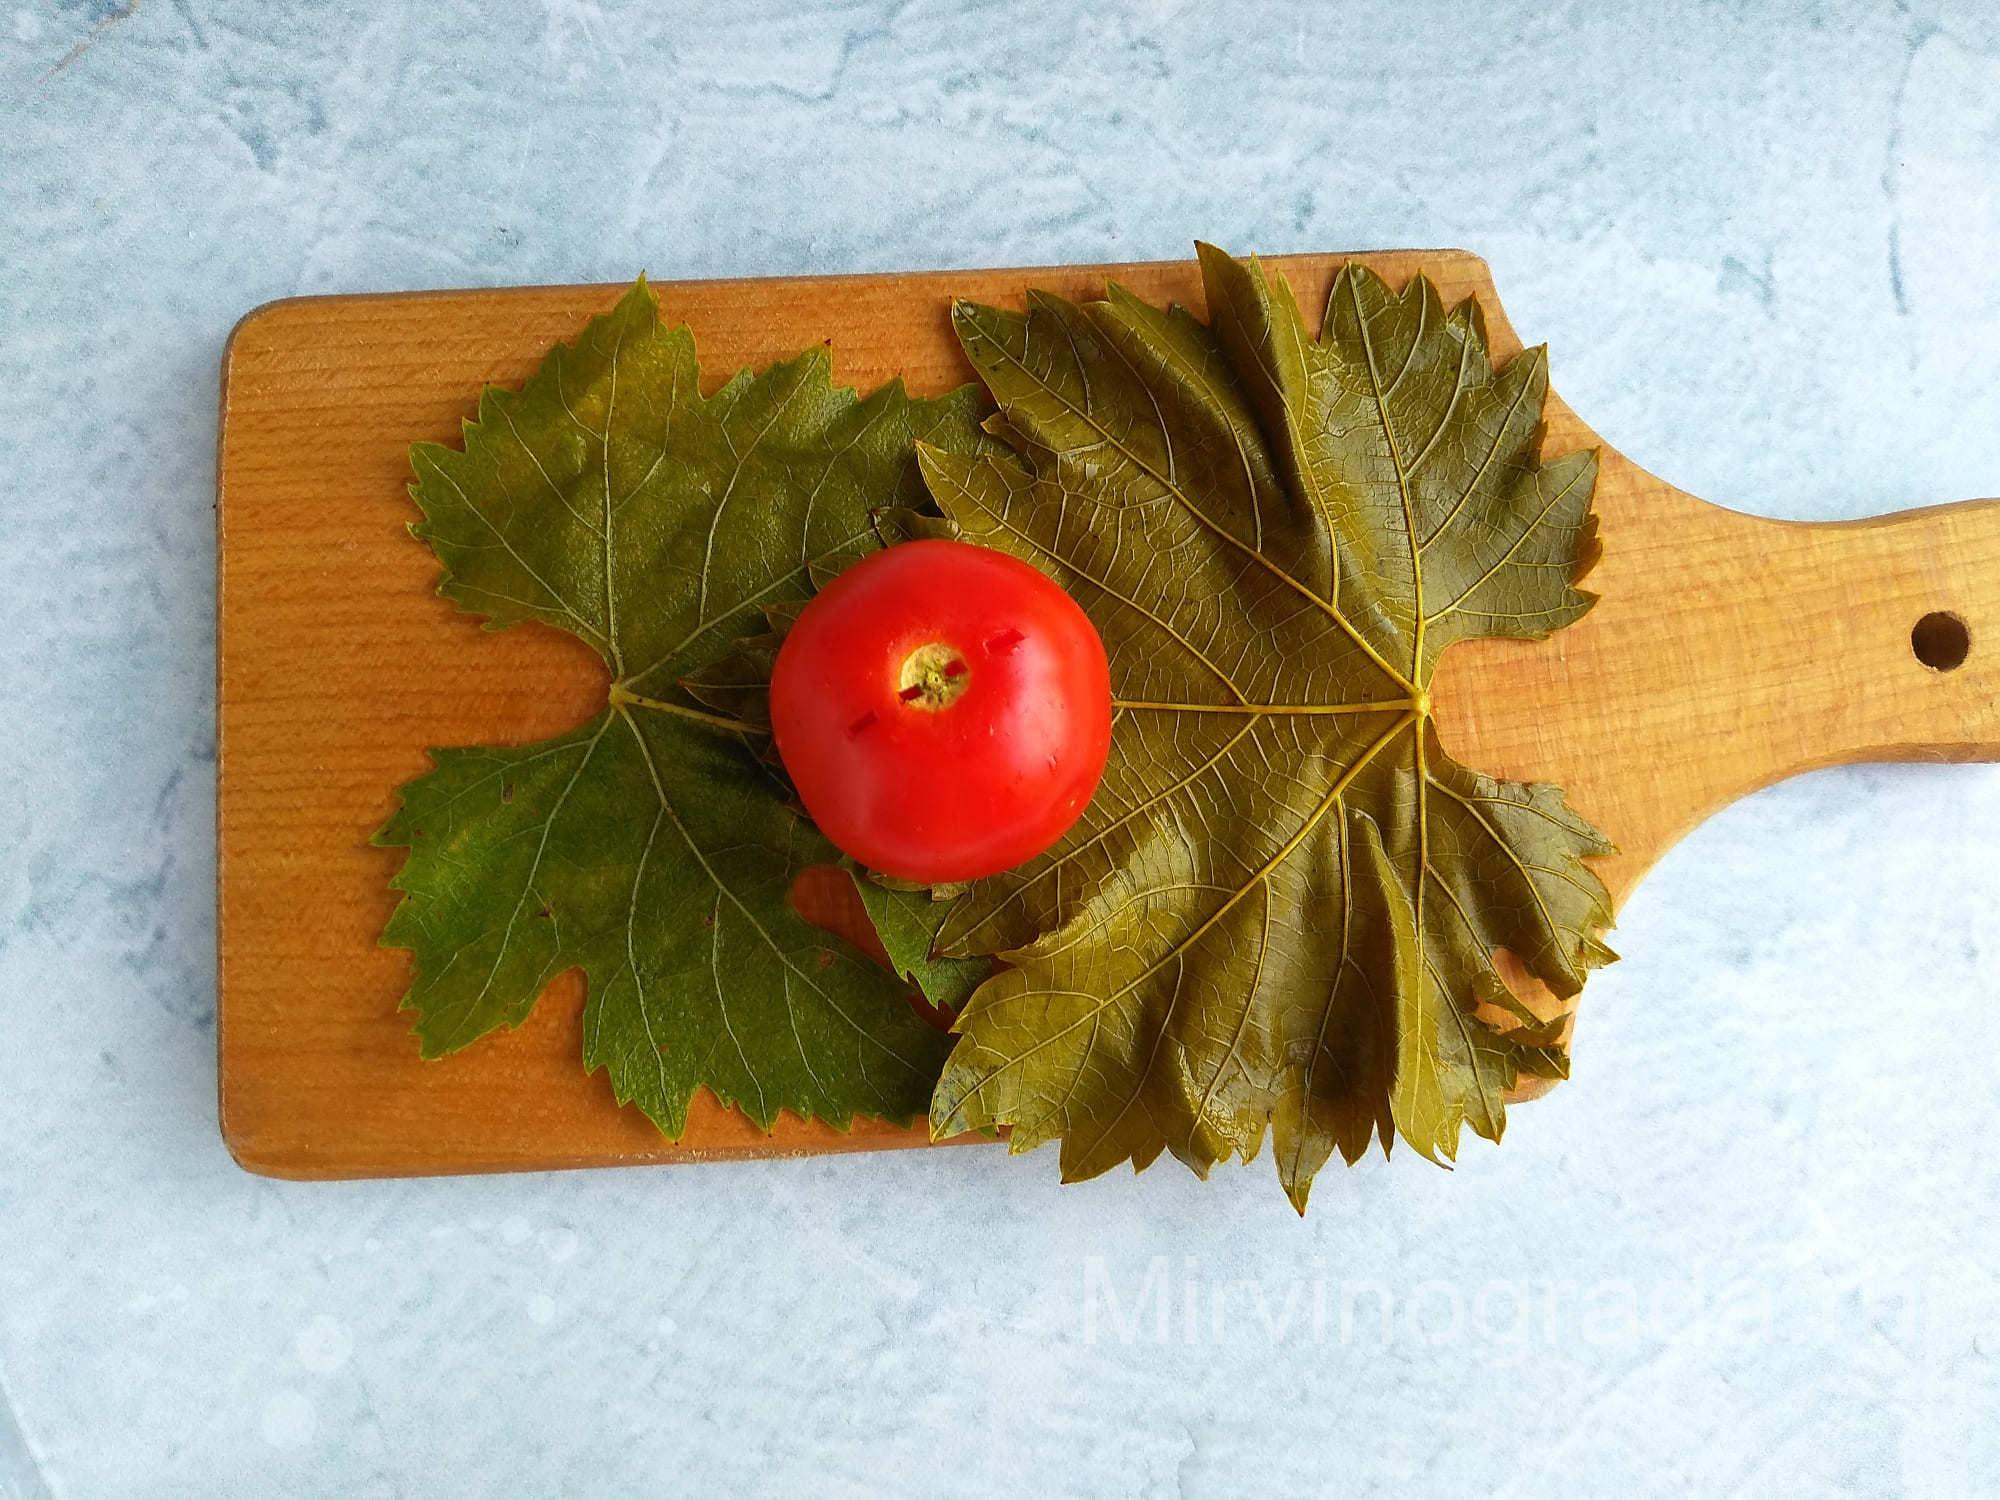 Заворачиваем помидор в листик винограда